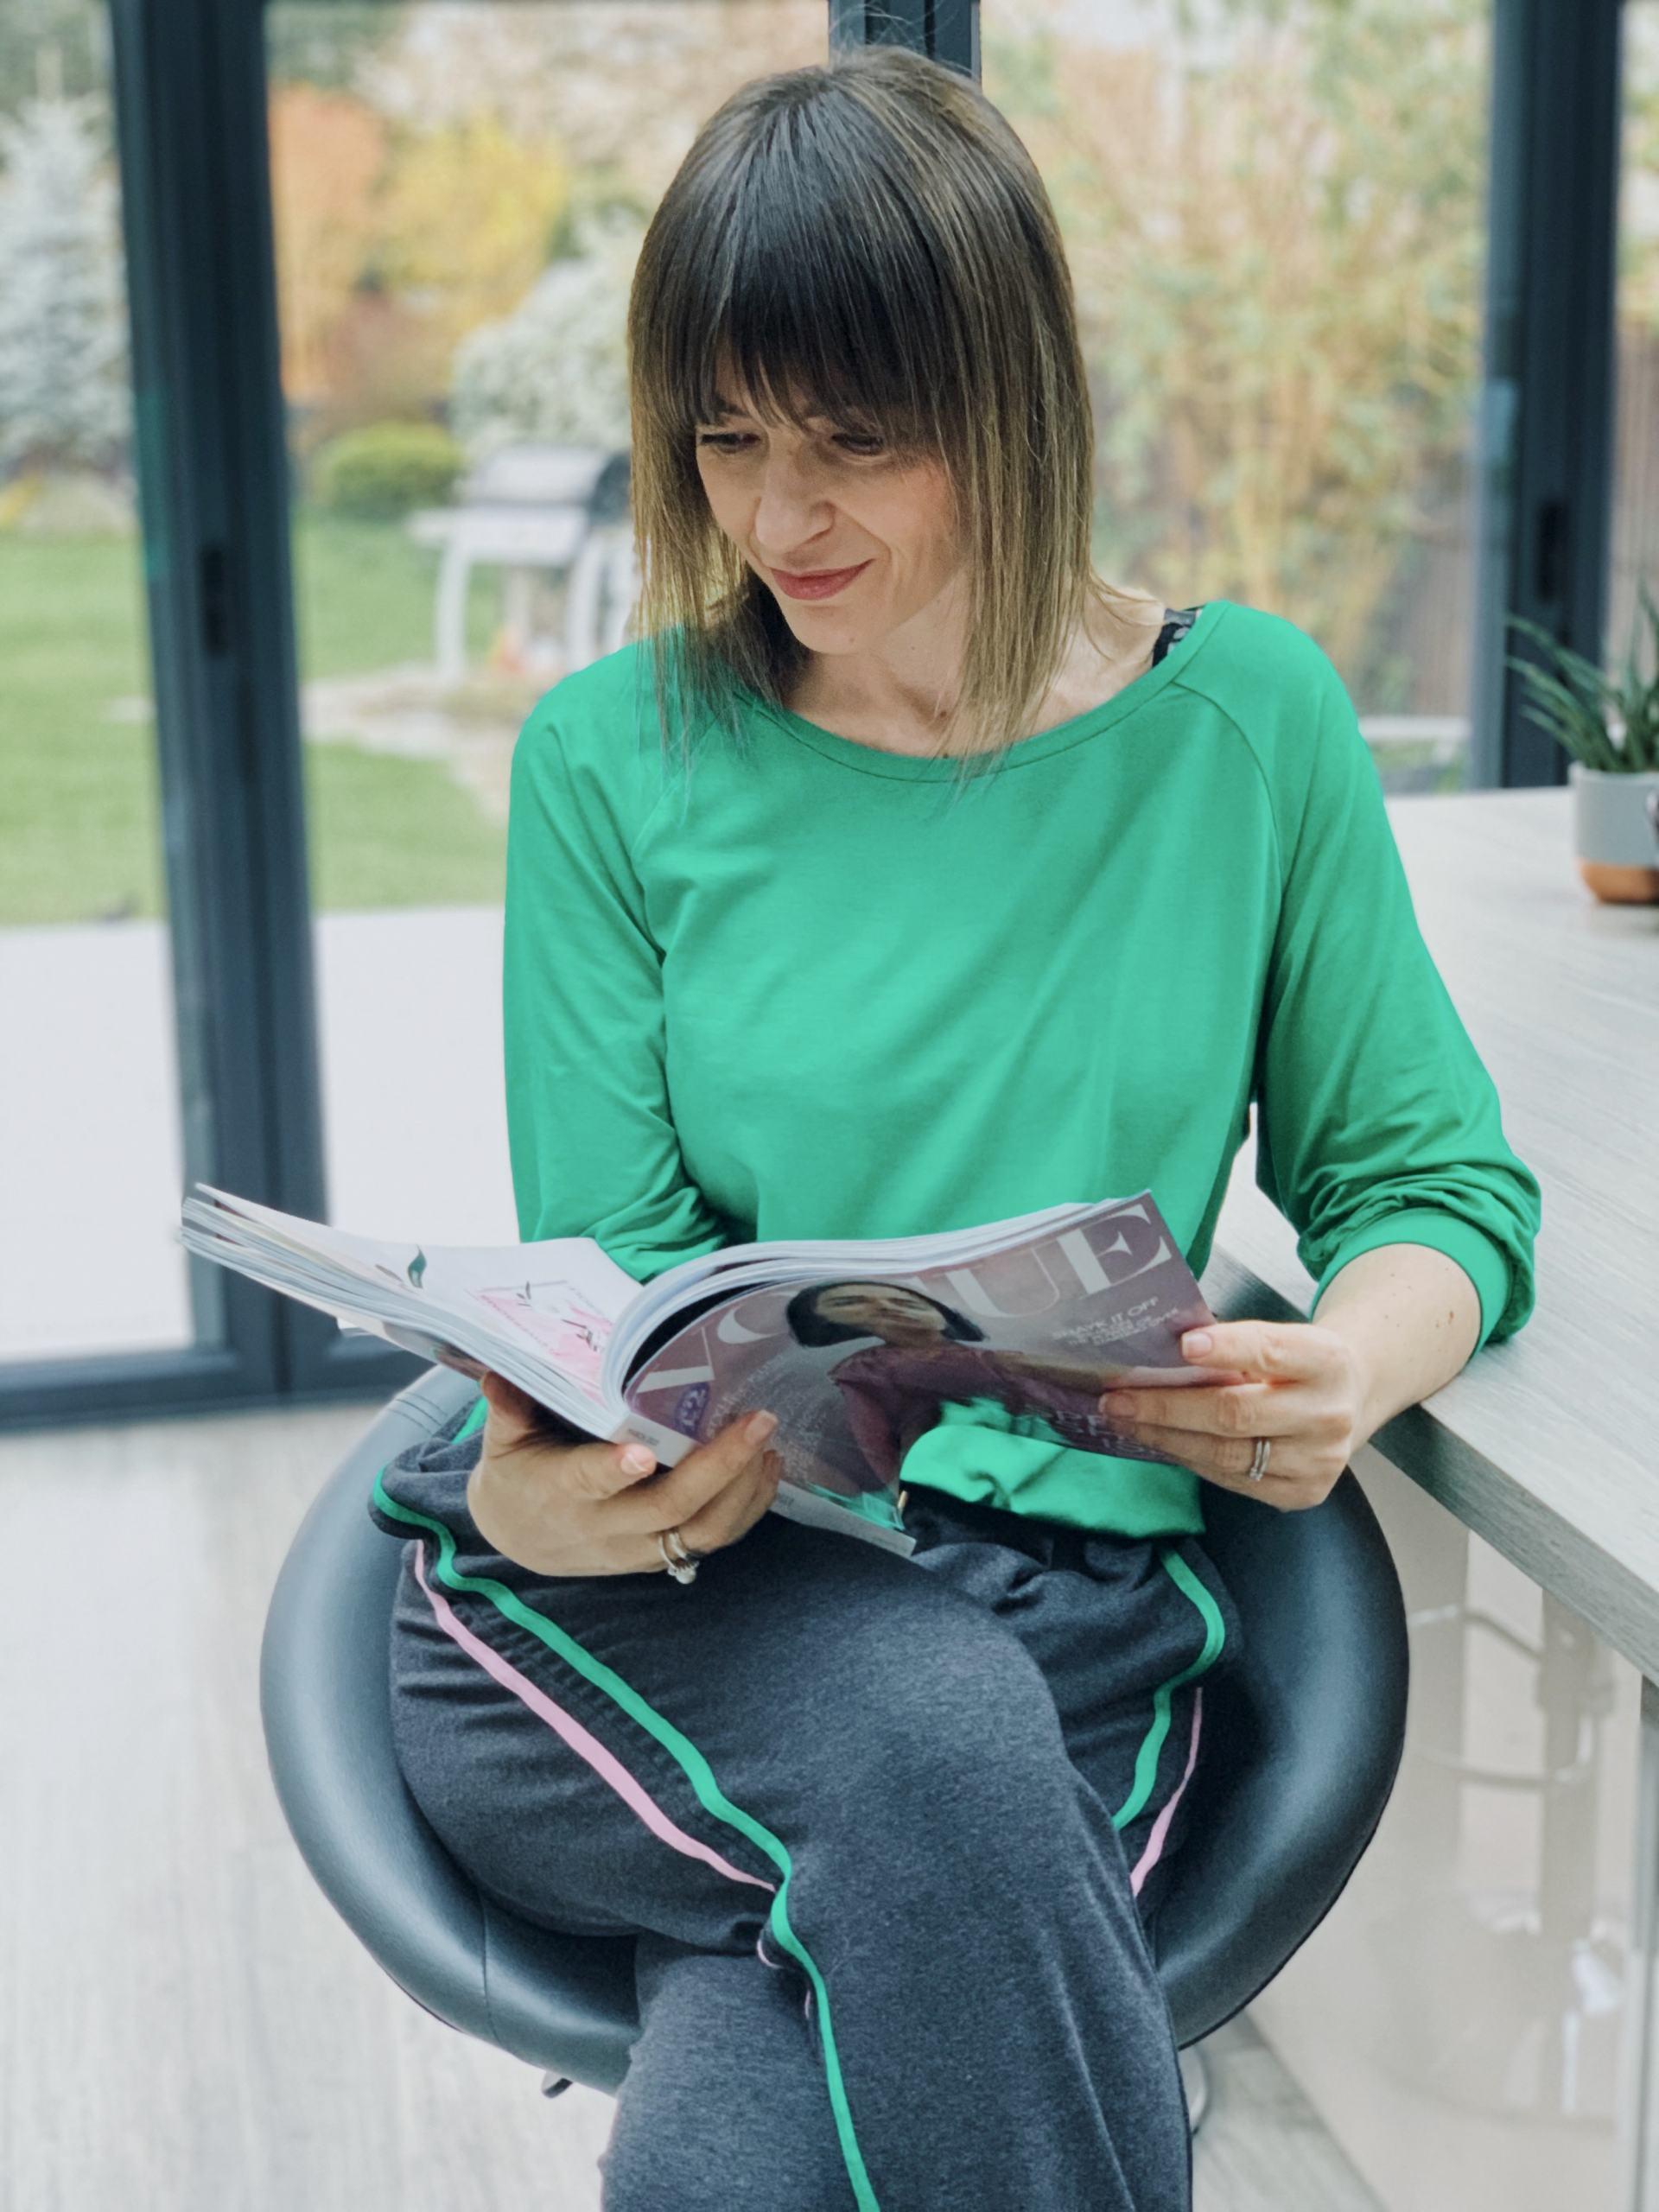 Lizzi sitting on a bar stool reading a magazine